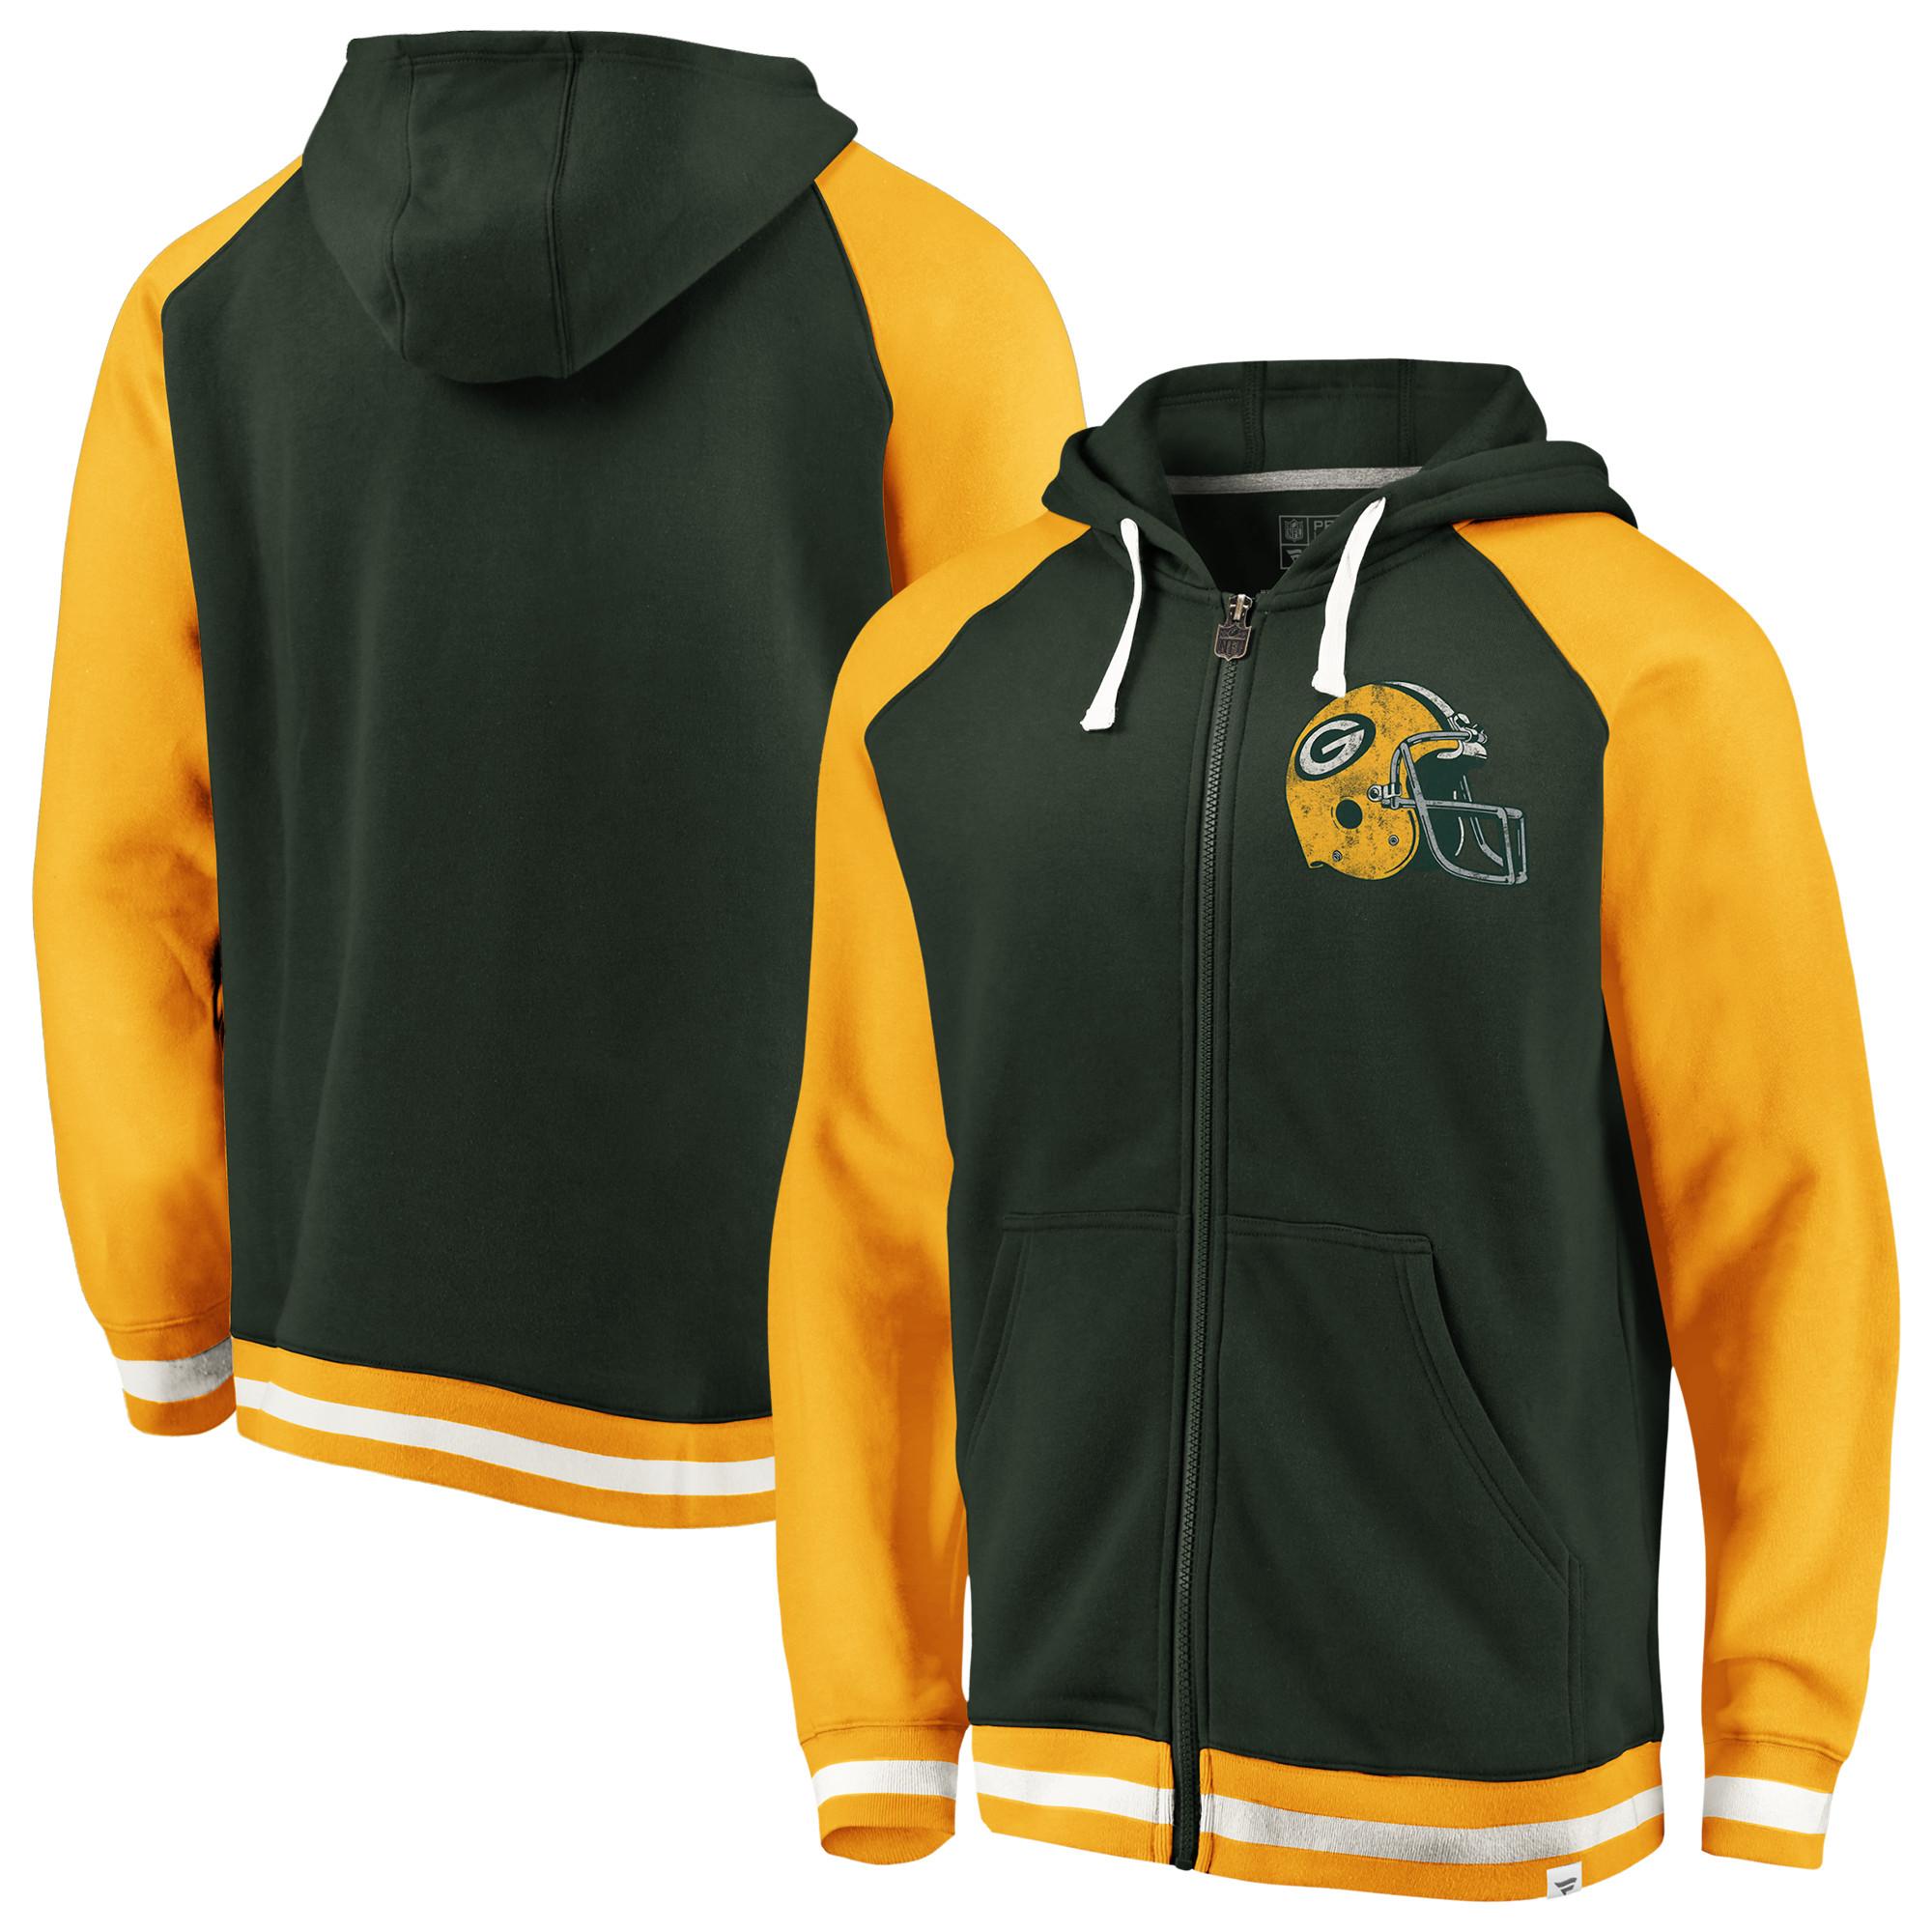 Green Bay Packers NFL Pro Line by Fanatics Branded True Classics Full-Zip Hoodie - Green/Gold